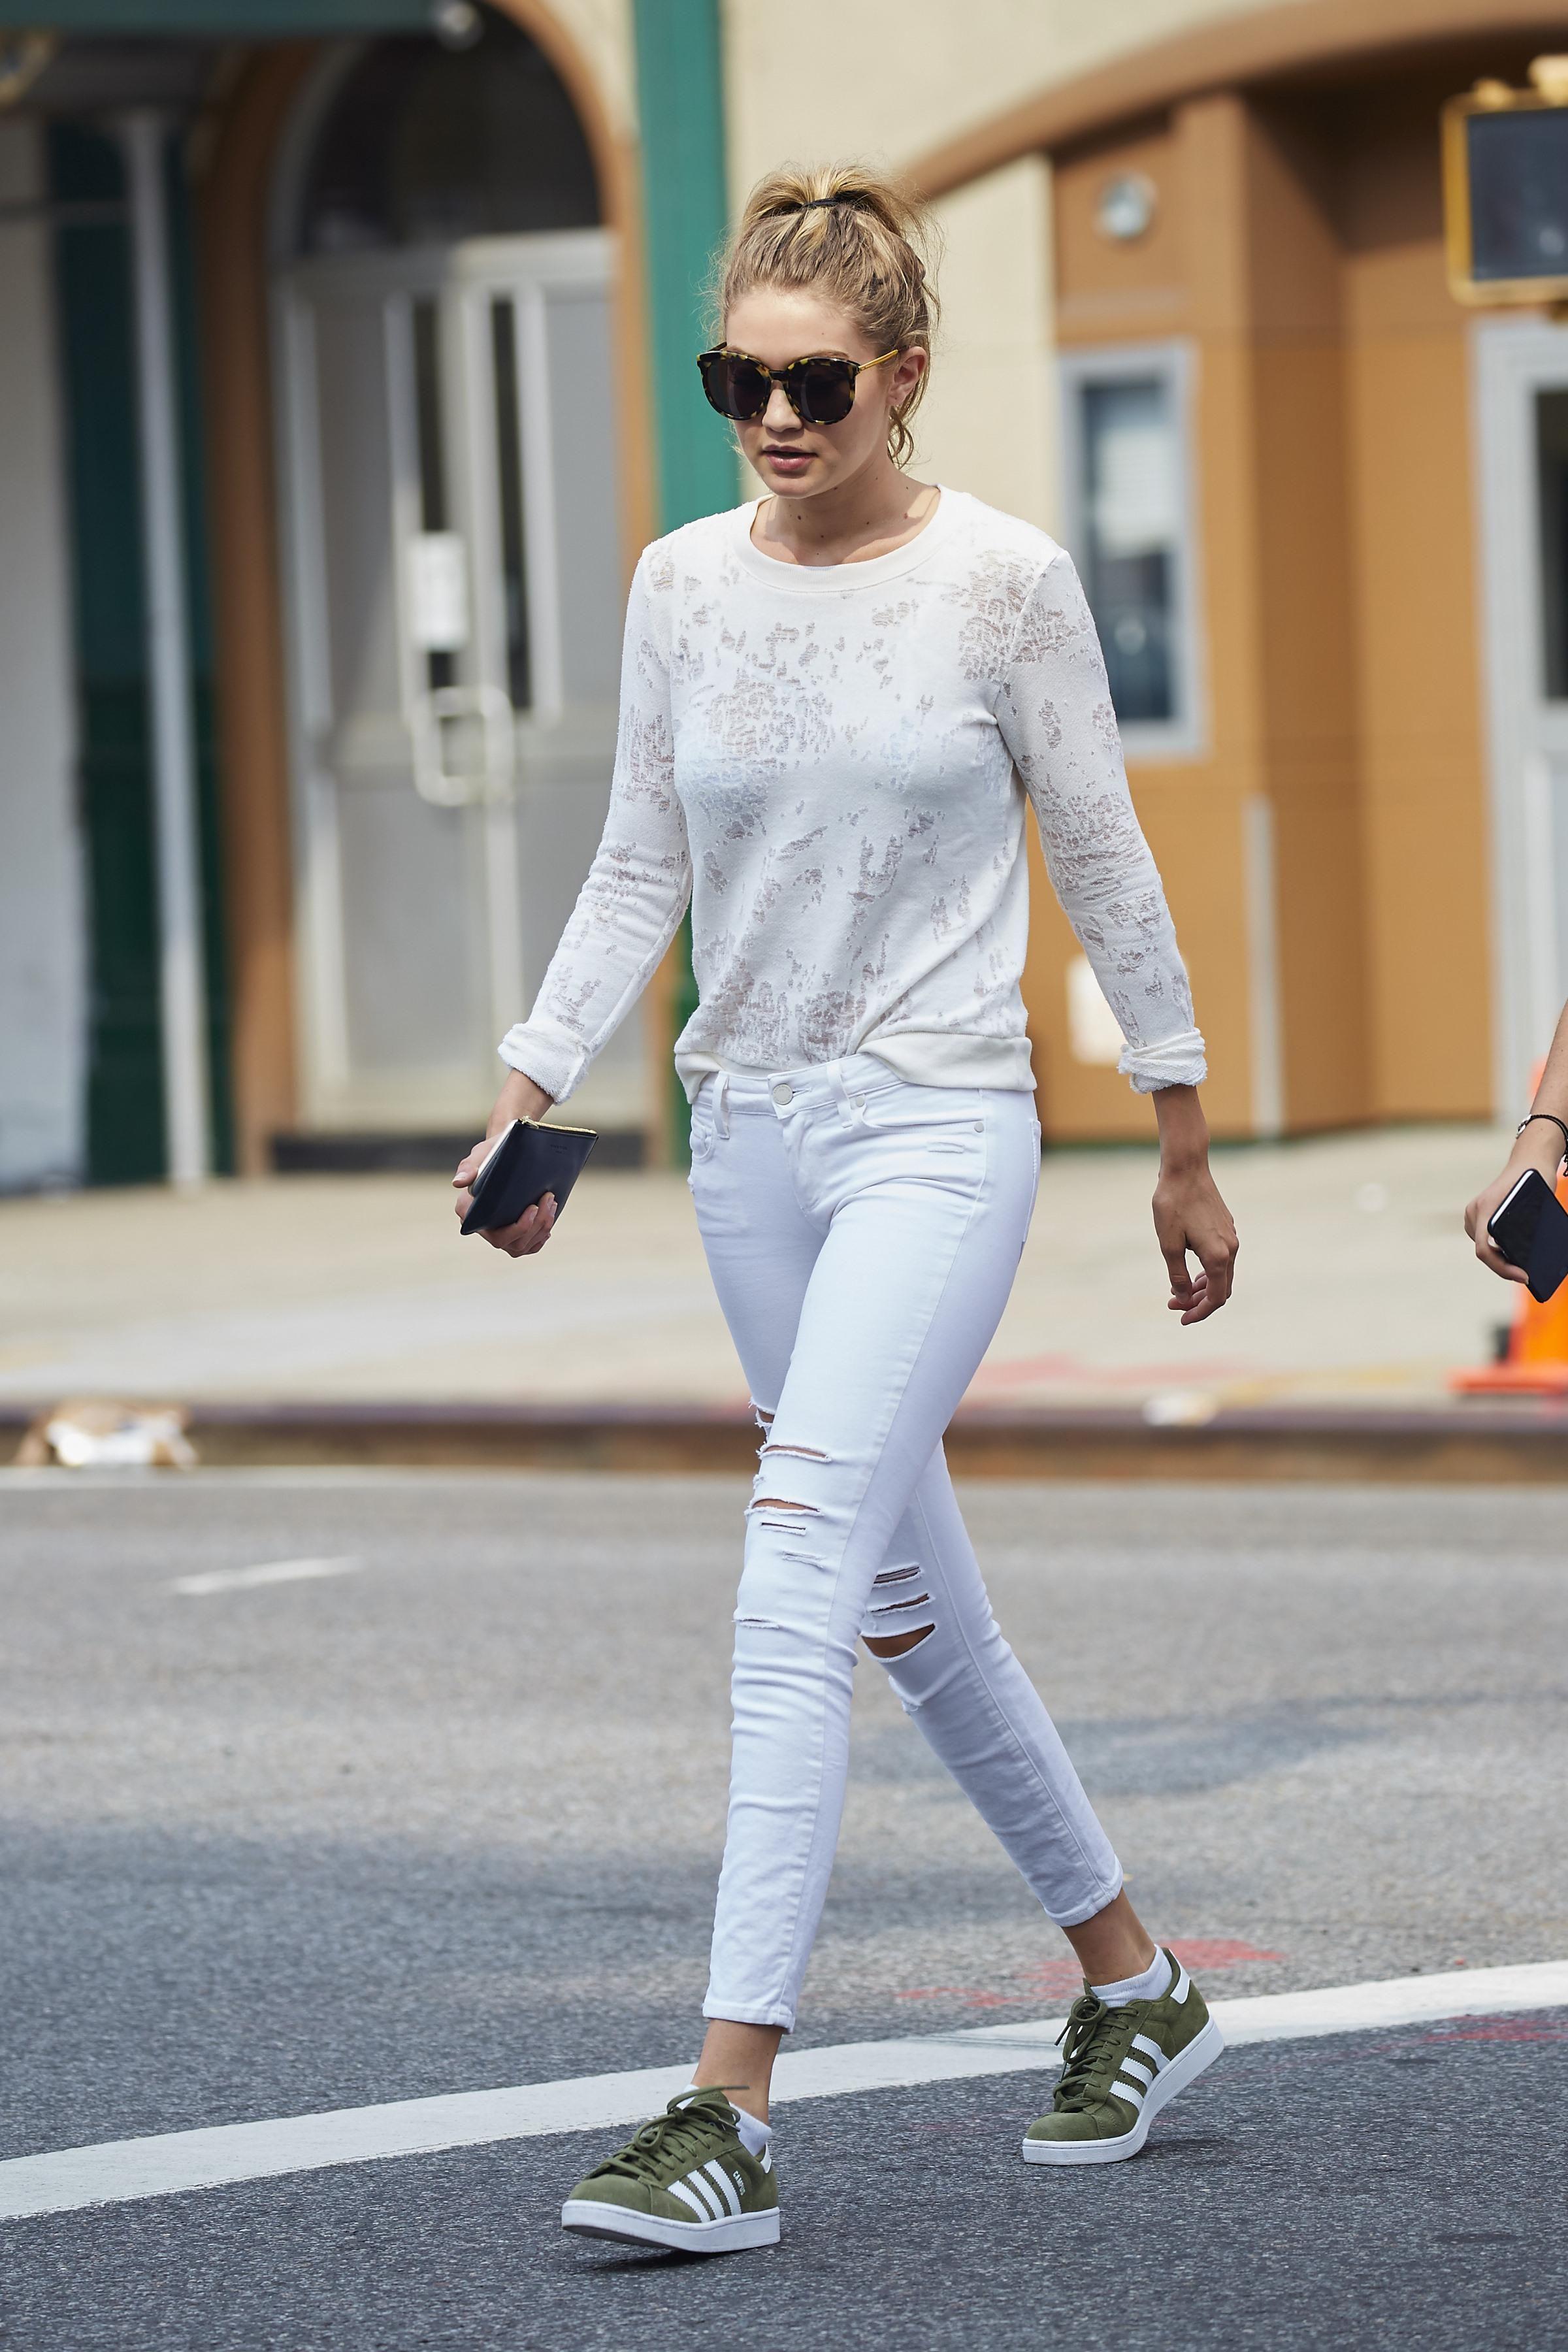 15 Times Gigi Hadid Has Turned Sneakers